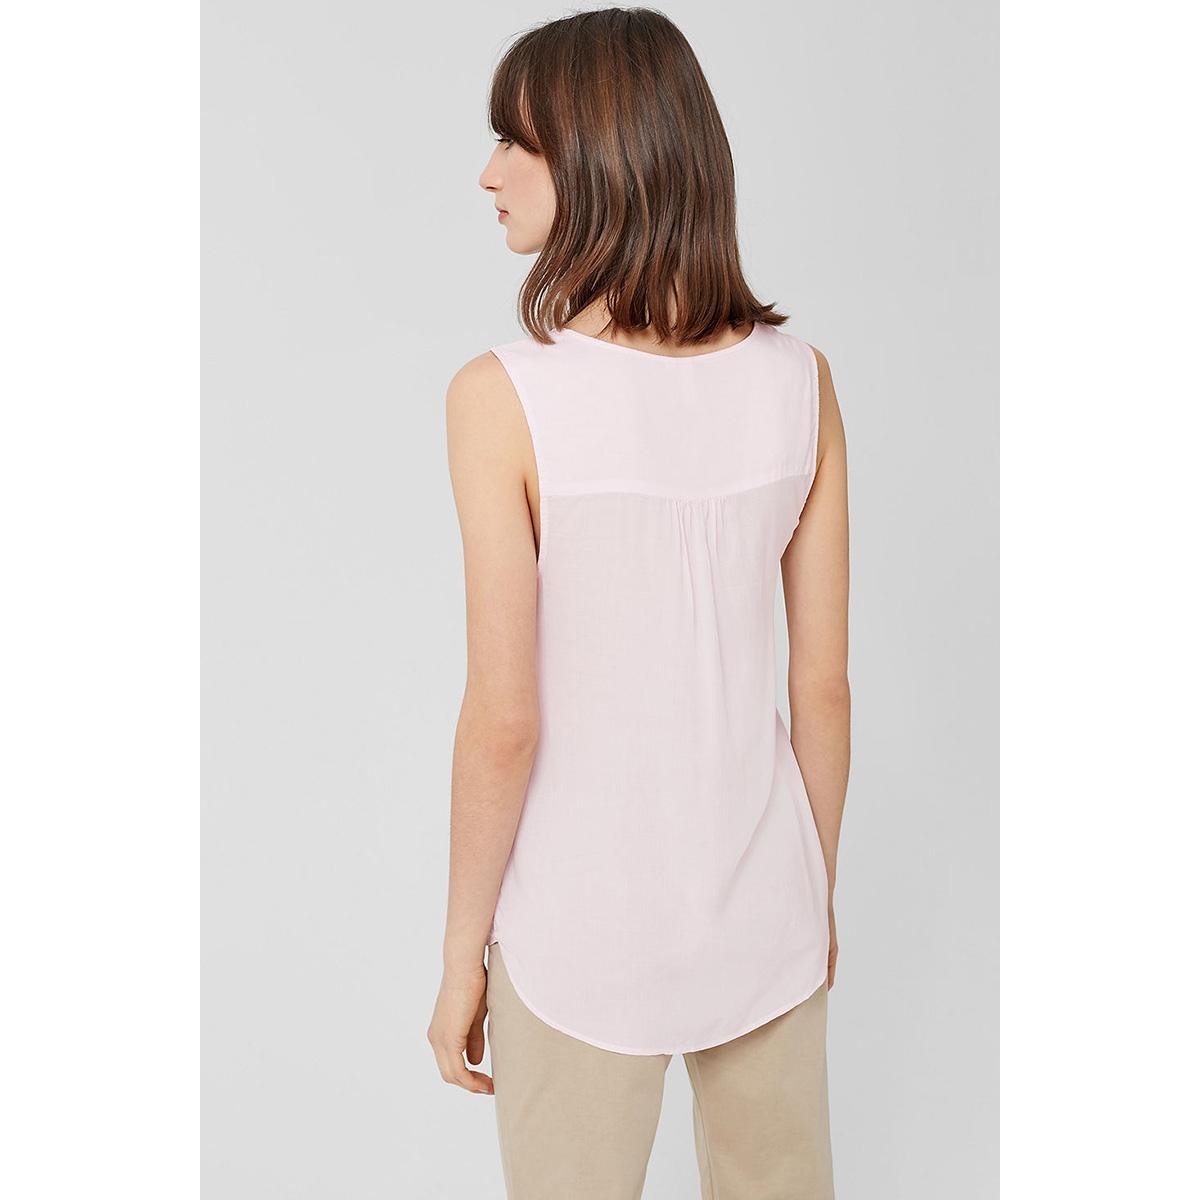 mouwloze half transparante blouse 45899135551 q/s designed by top 4030